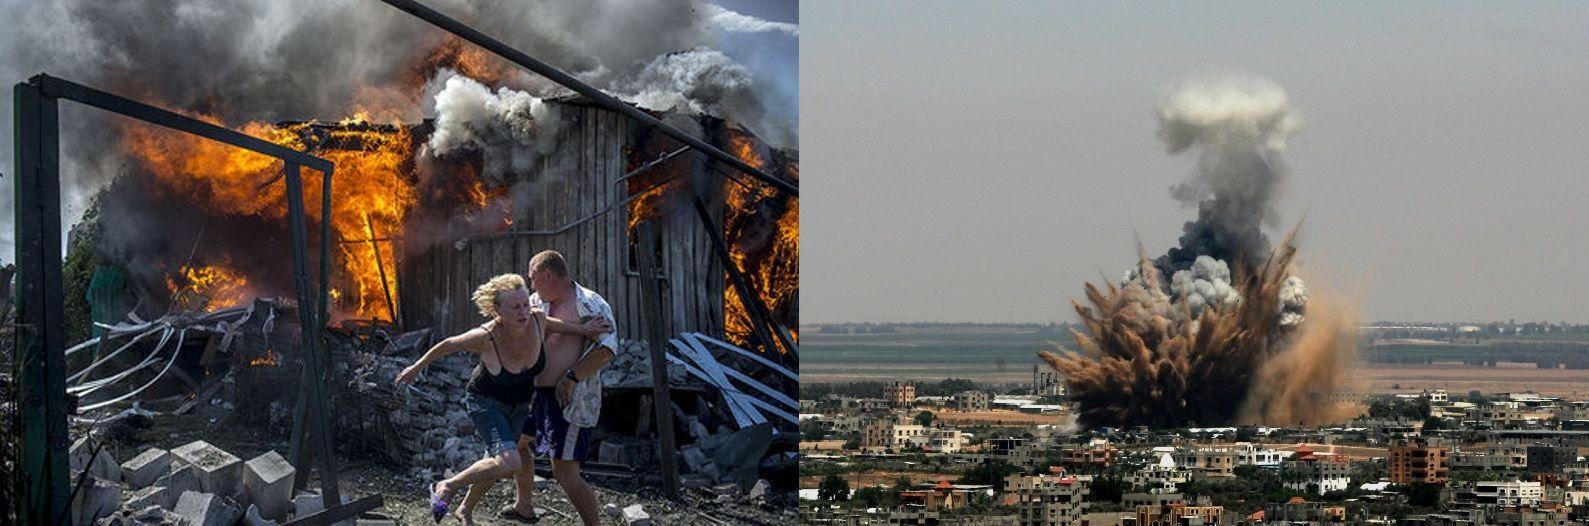 Bloggers terribly worried about Bozhena Rynska 04.06.2012 5